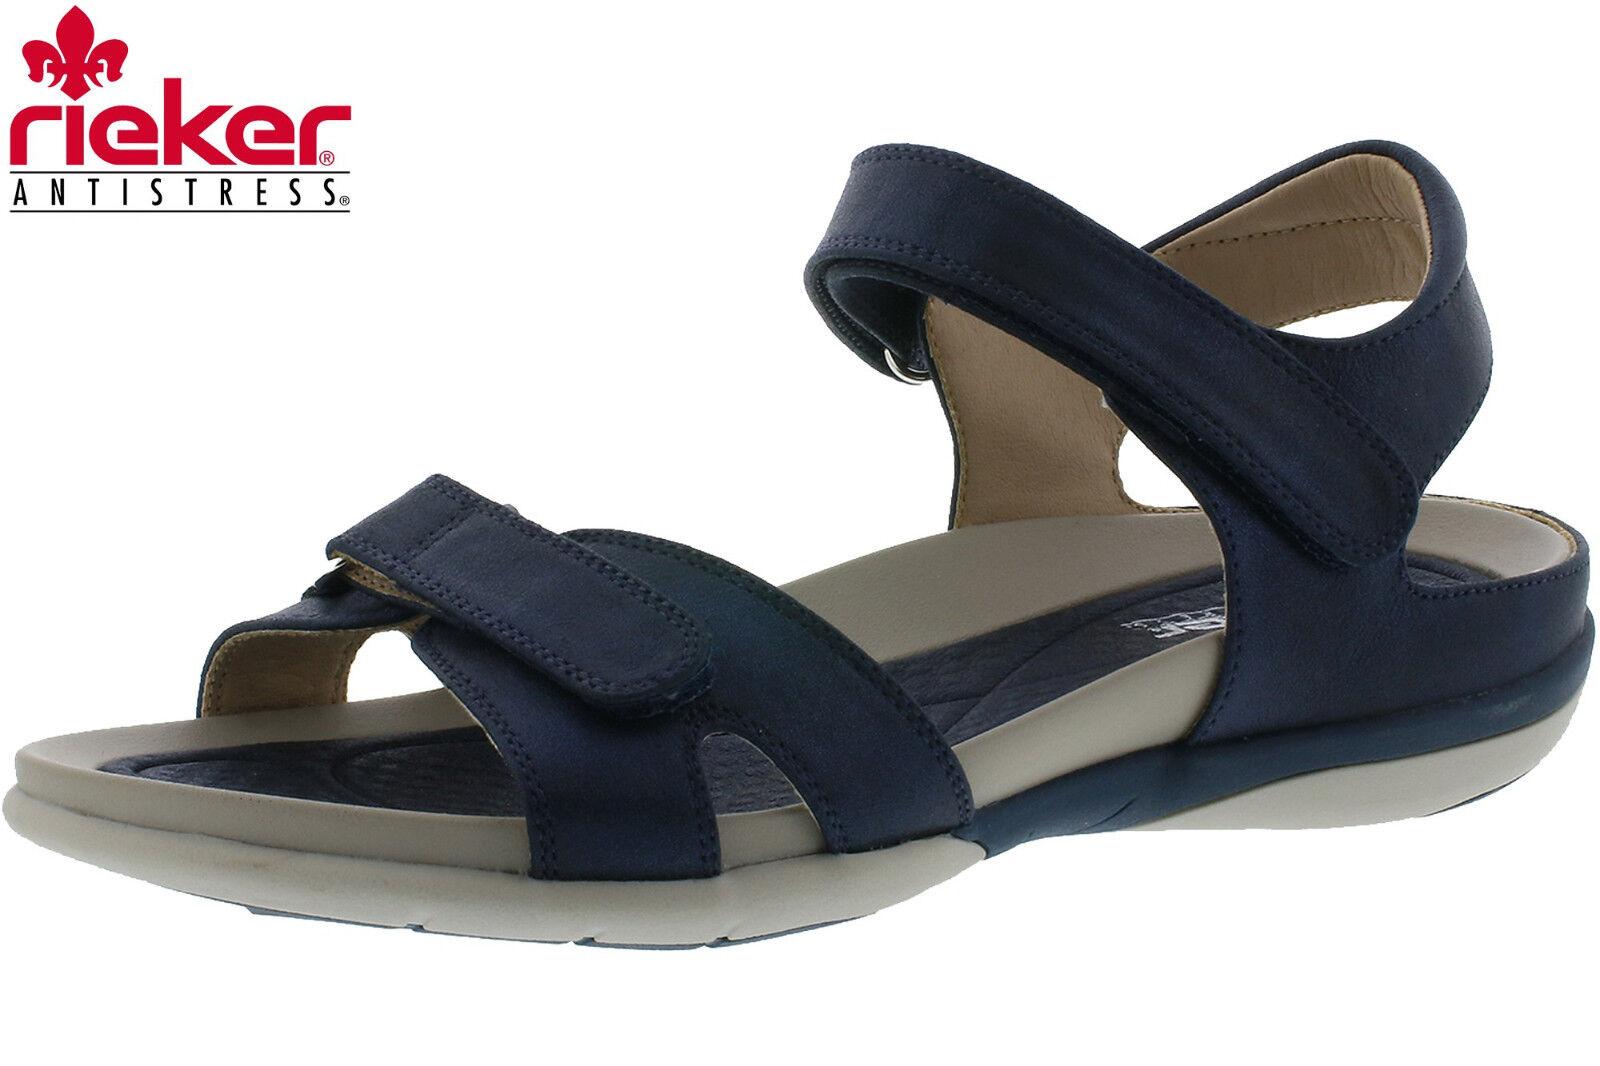 Rieker Damen Komfort Sandalee Blau Trekking Outdoor Schuhe V9462-14 NEU